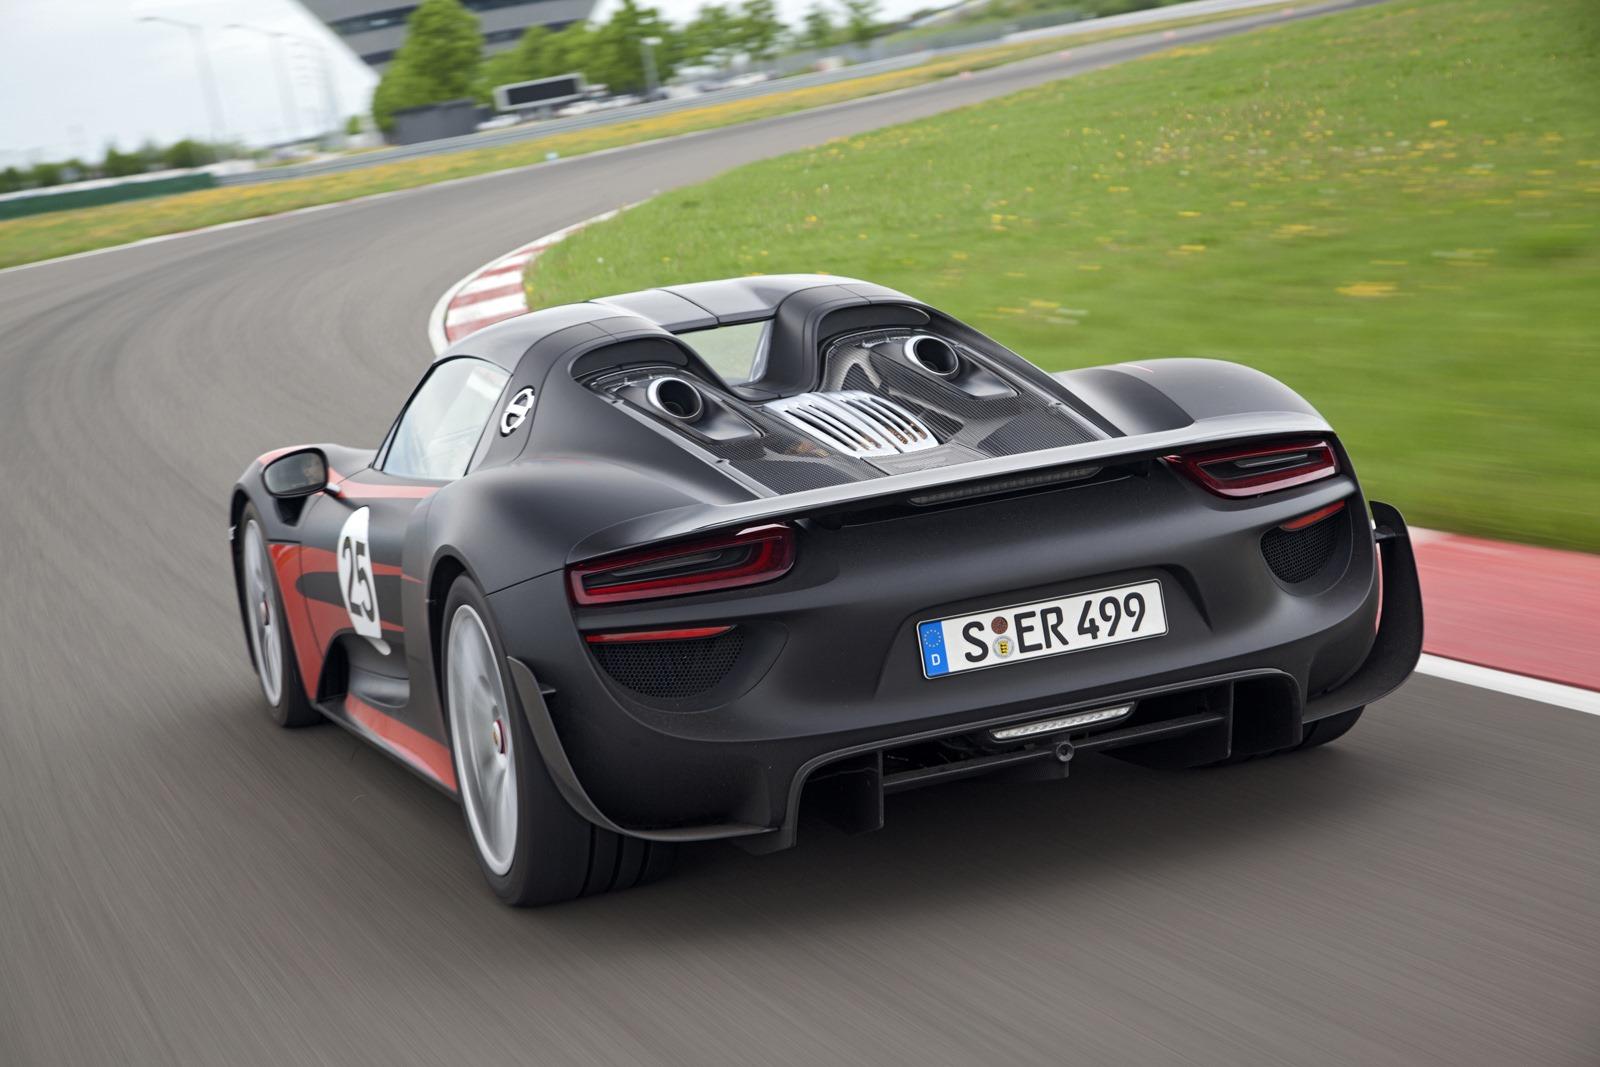 Porsche Releases New 918 Spyder Technical Details